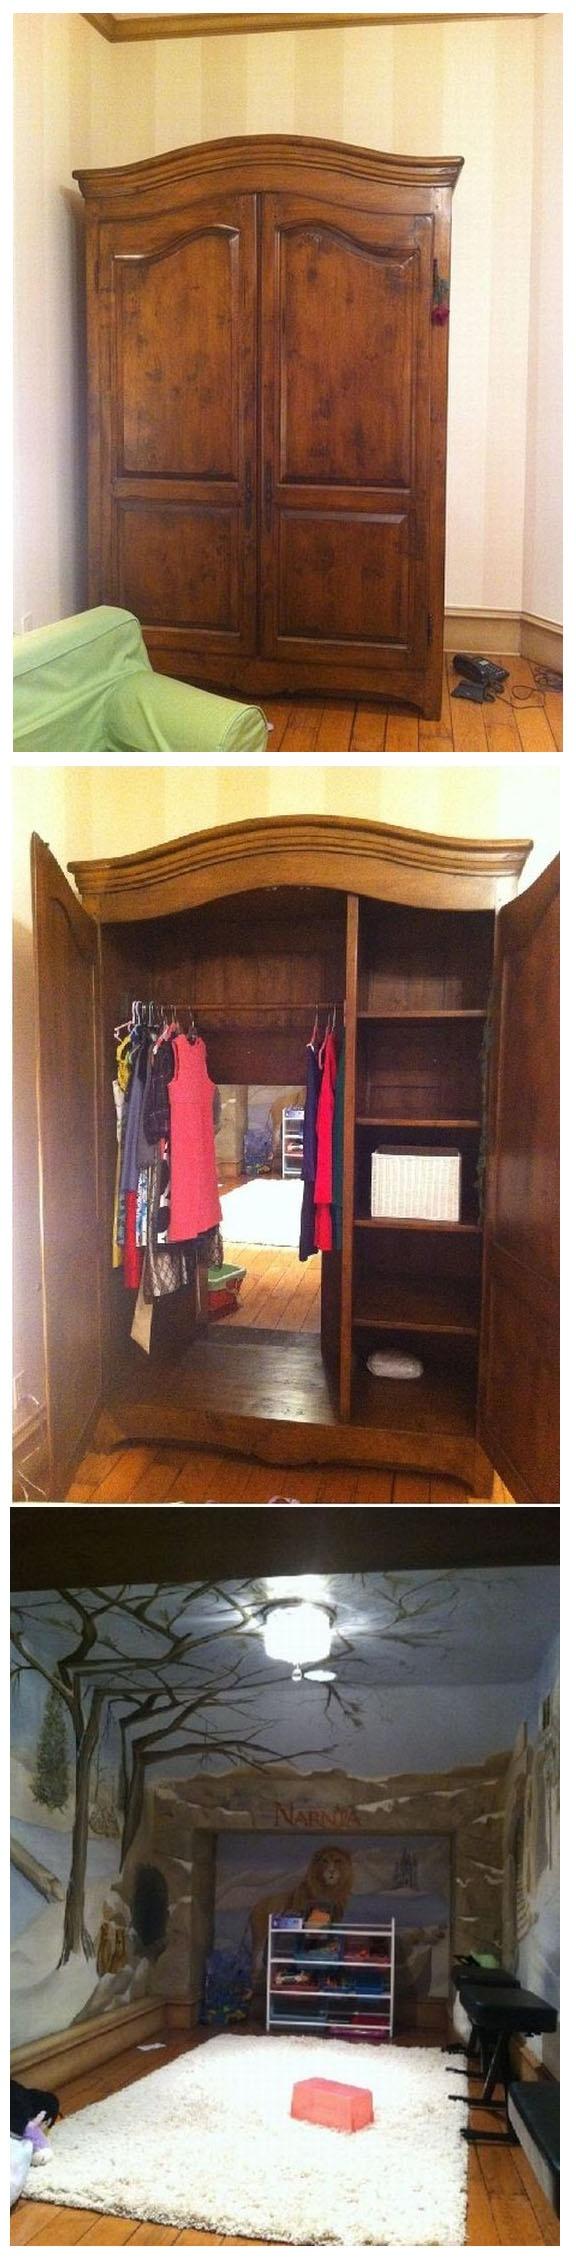 Best 25+ Panic Rooms Ideas On Pinterest | Hidden Panic Rooms, Secret  Passage And Underground Storm Shelters